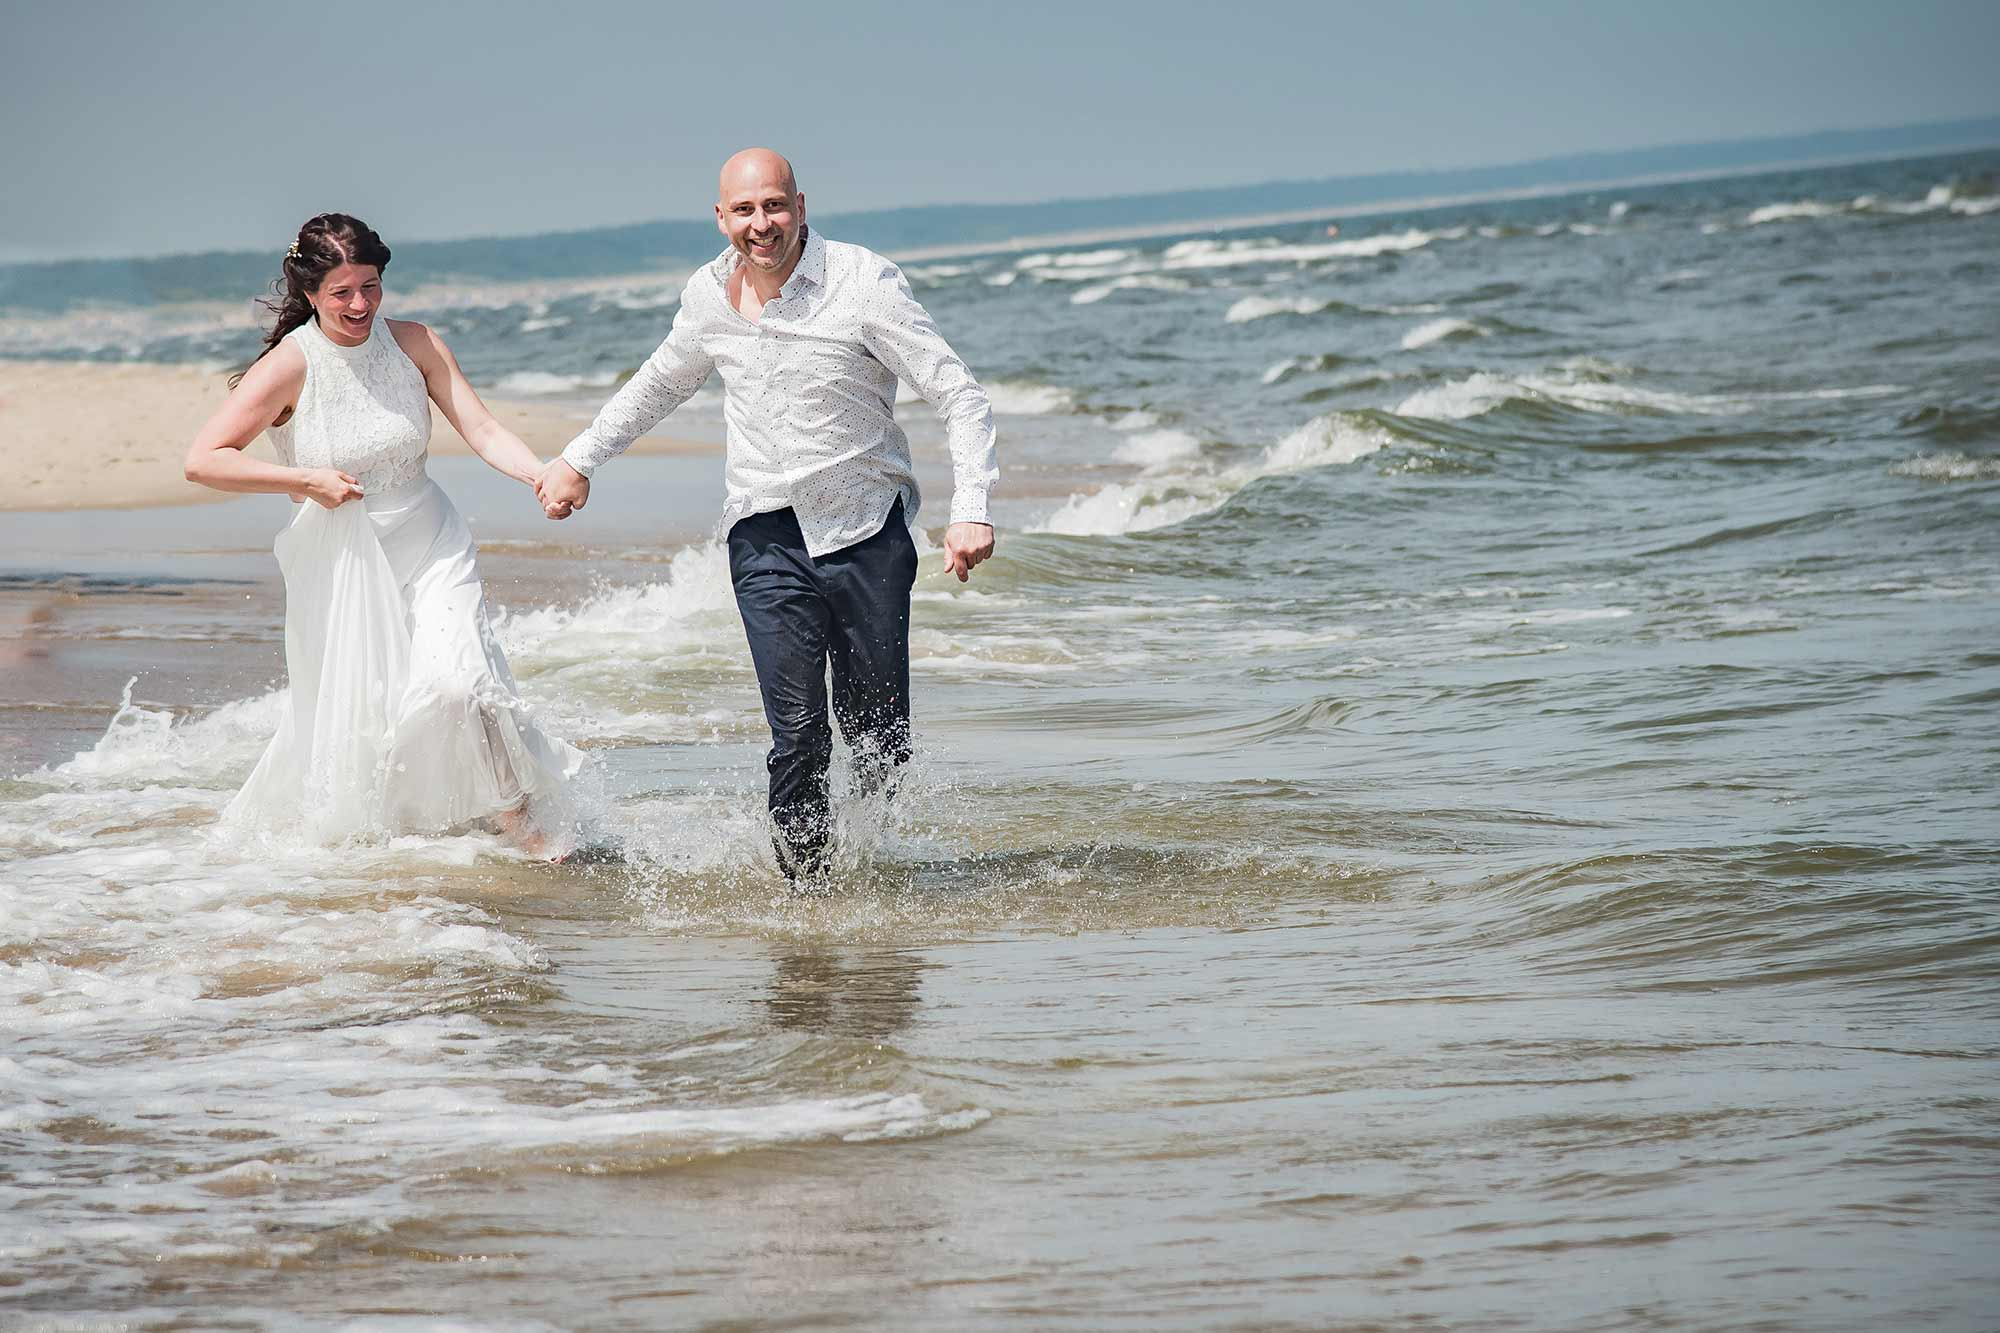 Hochzeitsfotograf Insel Usedom Trauung Brautpaar im Wasser